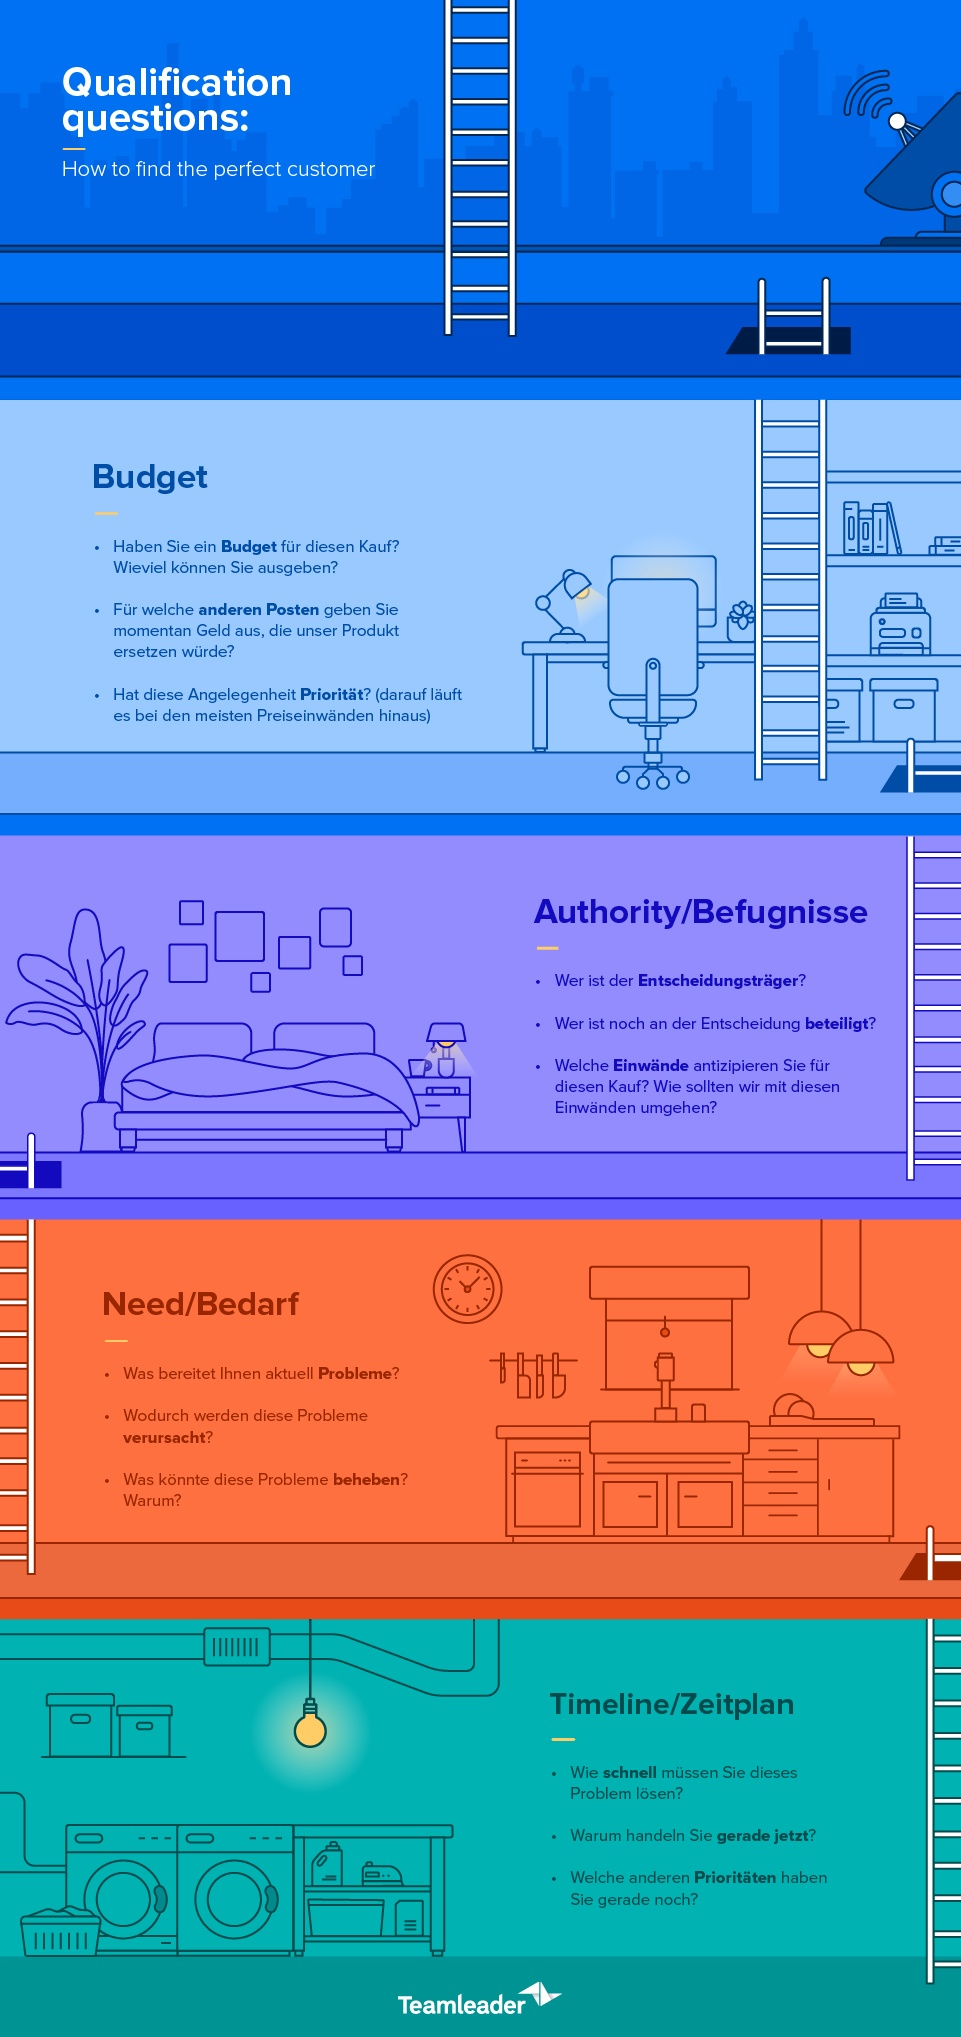 Blog3_QualifyLeads_Infographic_DE